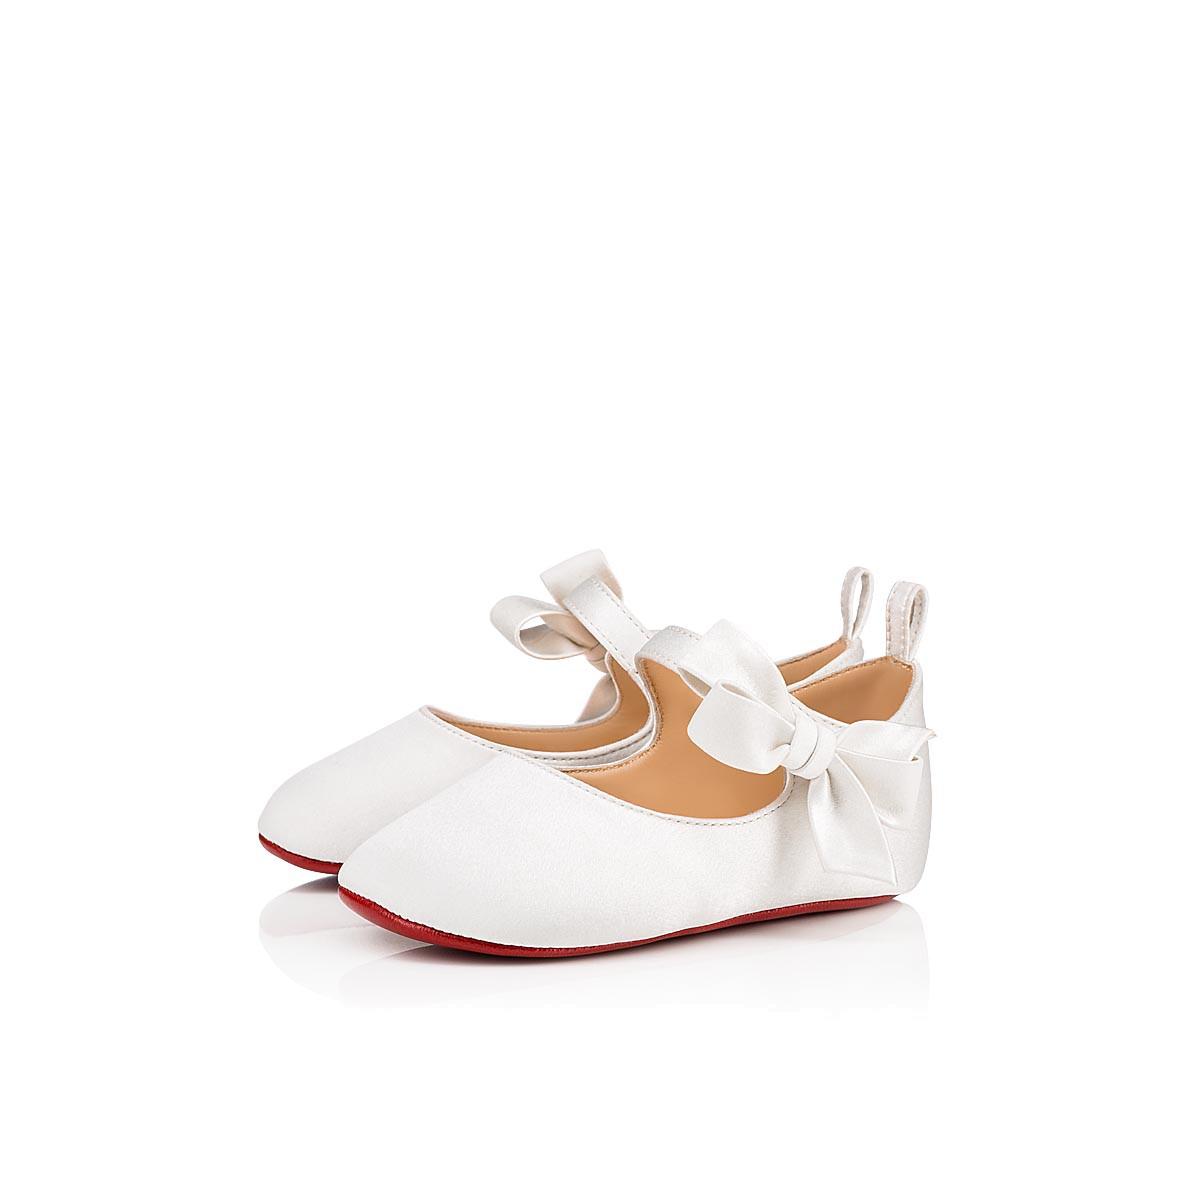 Shoes - Lou Babe - Christian Louboutin